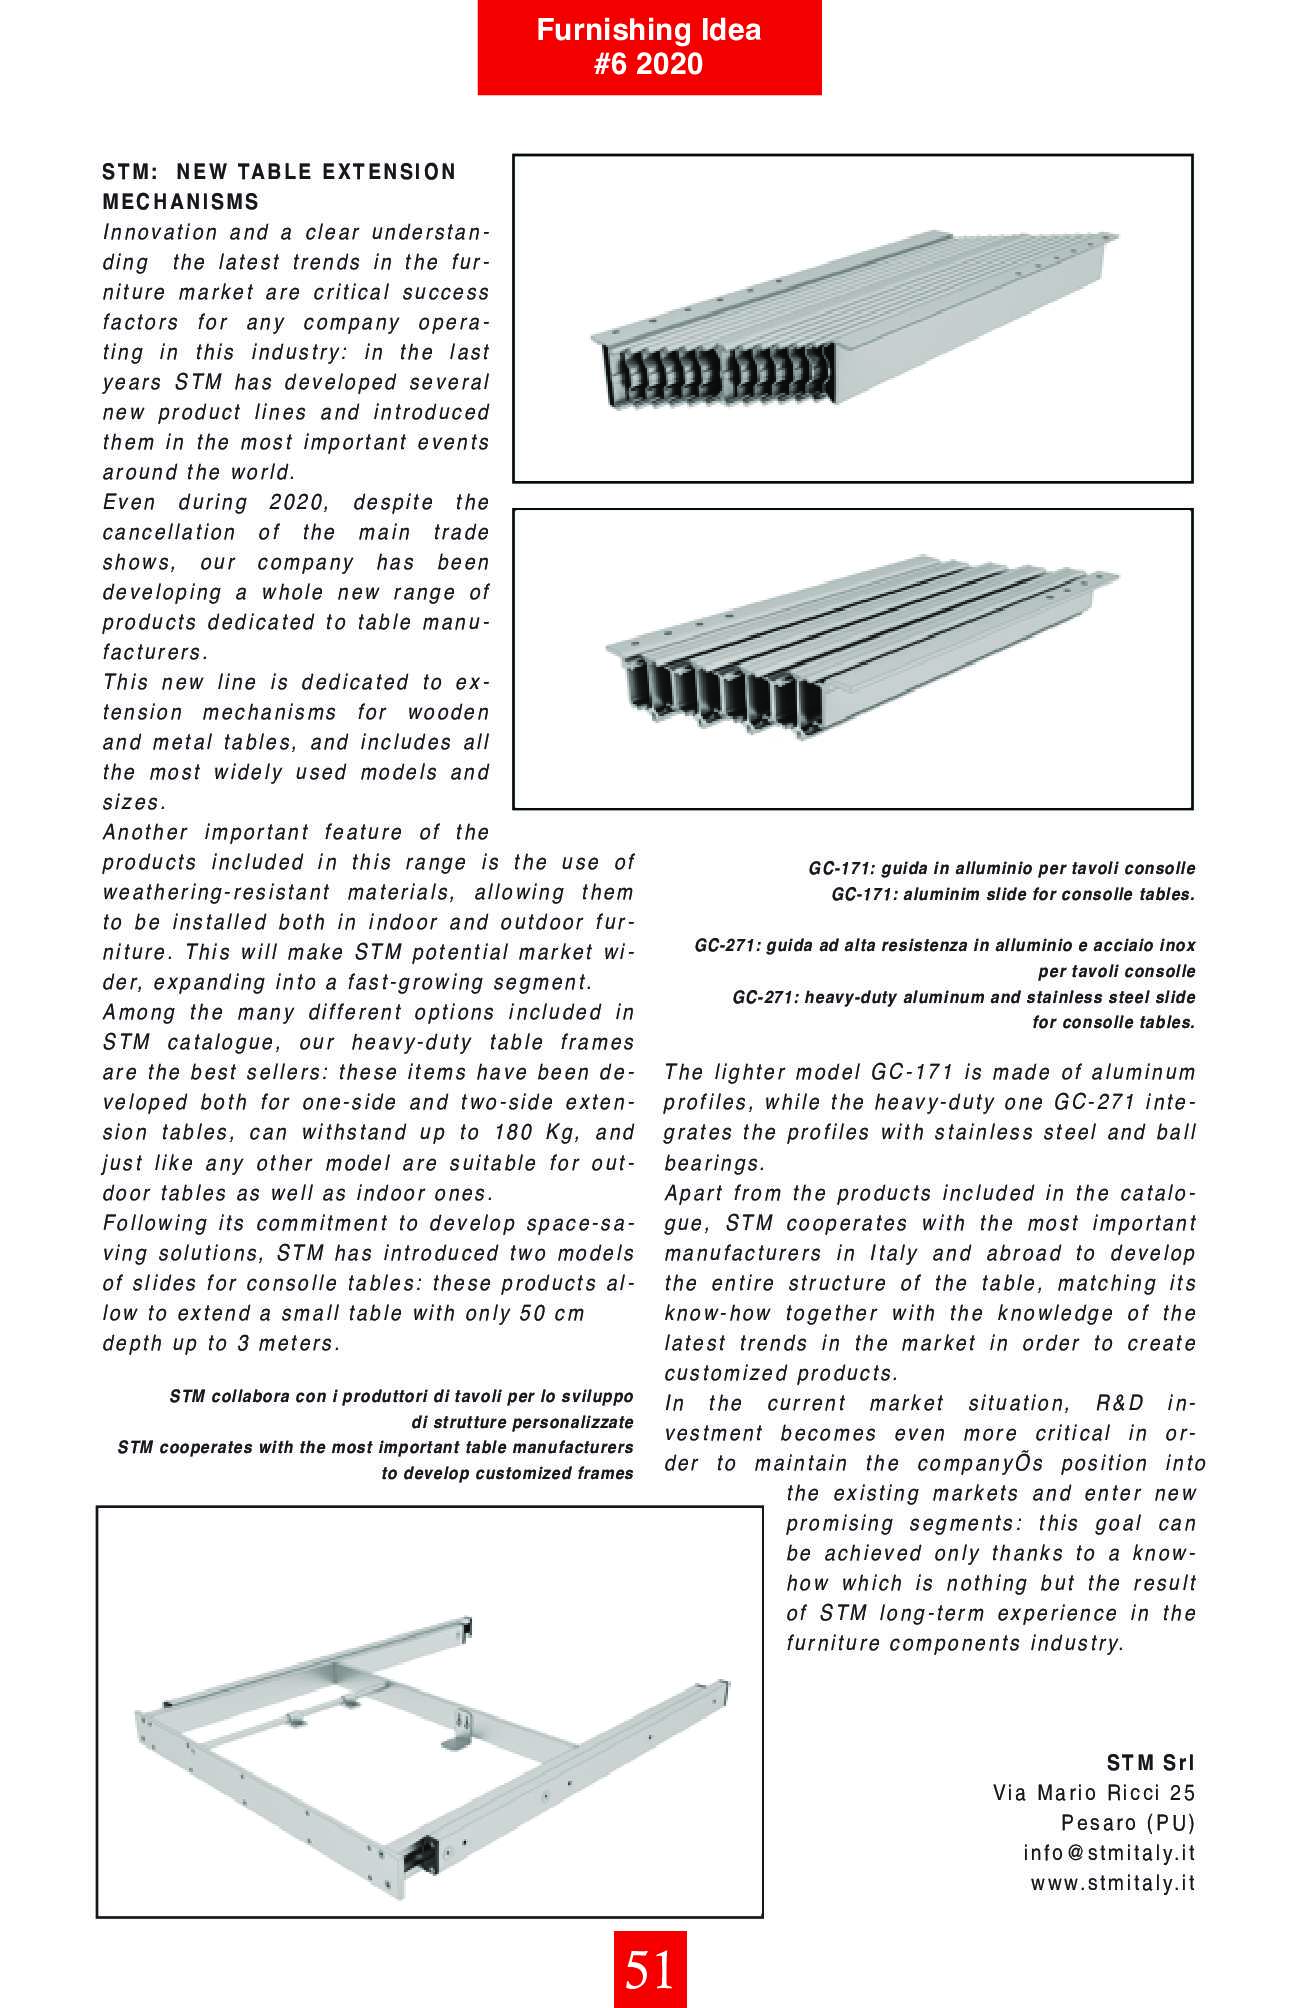 furnishingidea-6-2020_journal_22_050.jpg